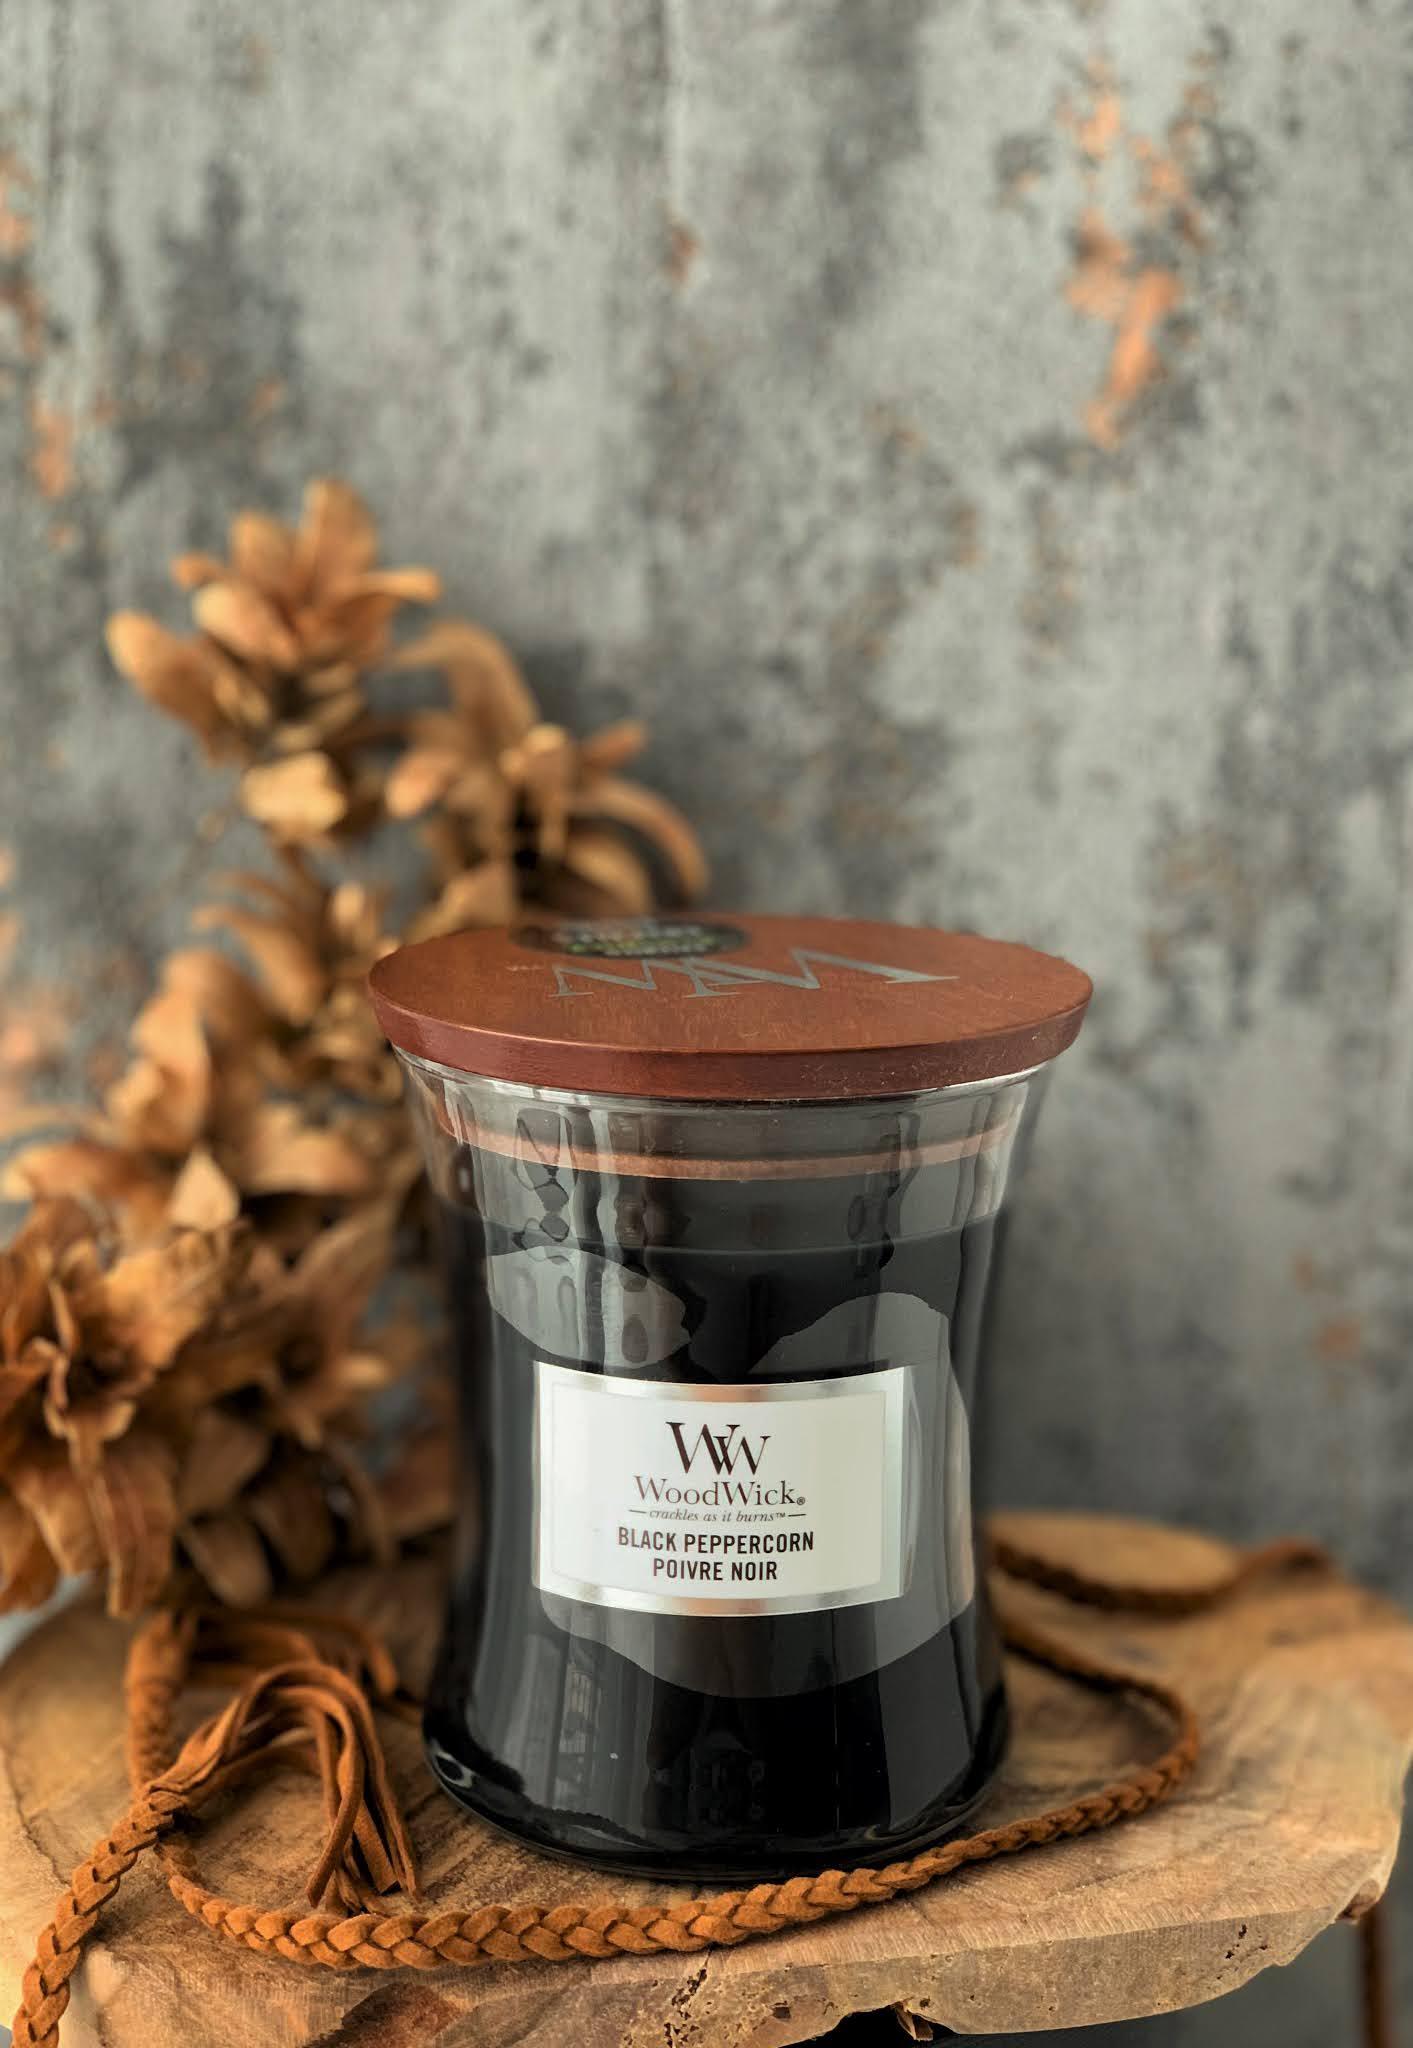 Black-Peppercorn-WoodWick